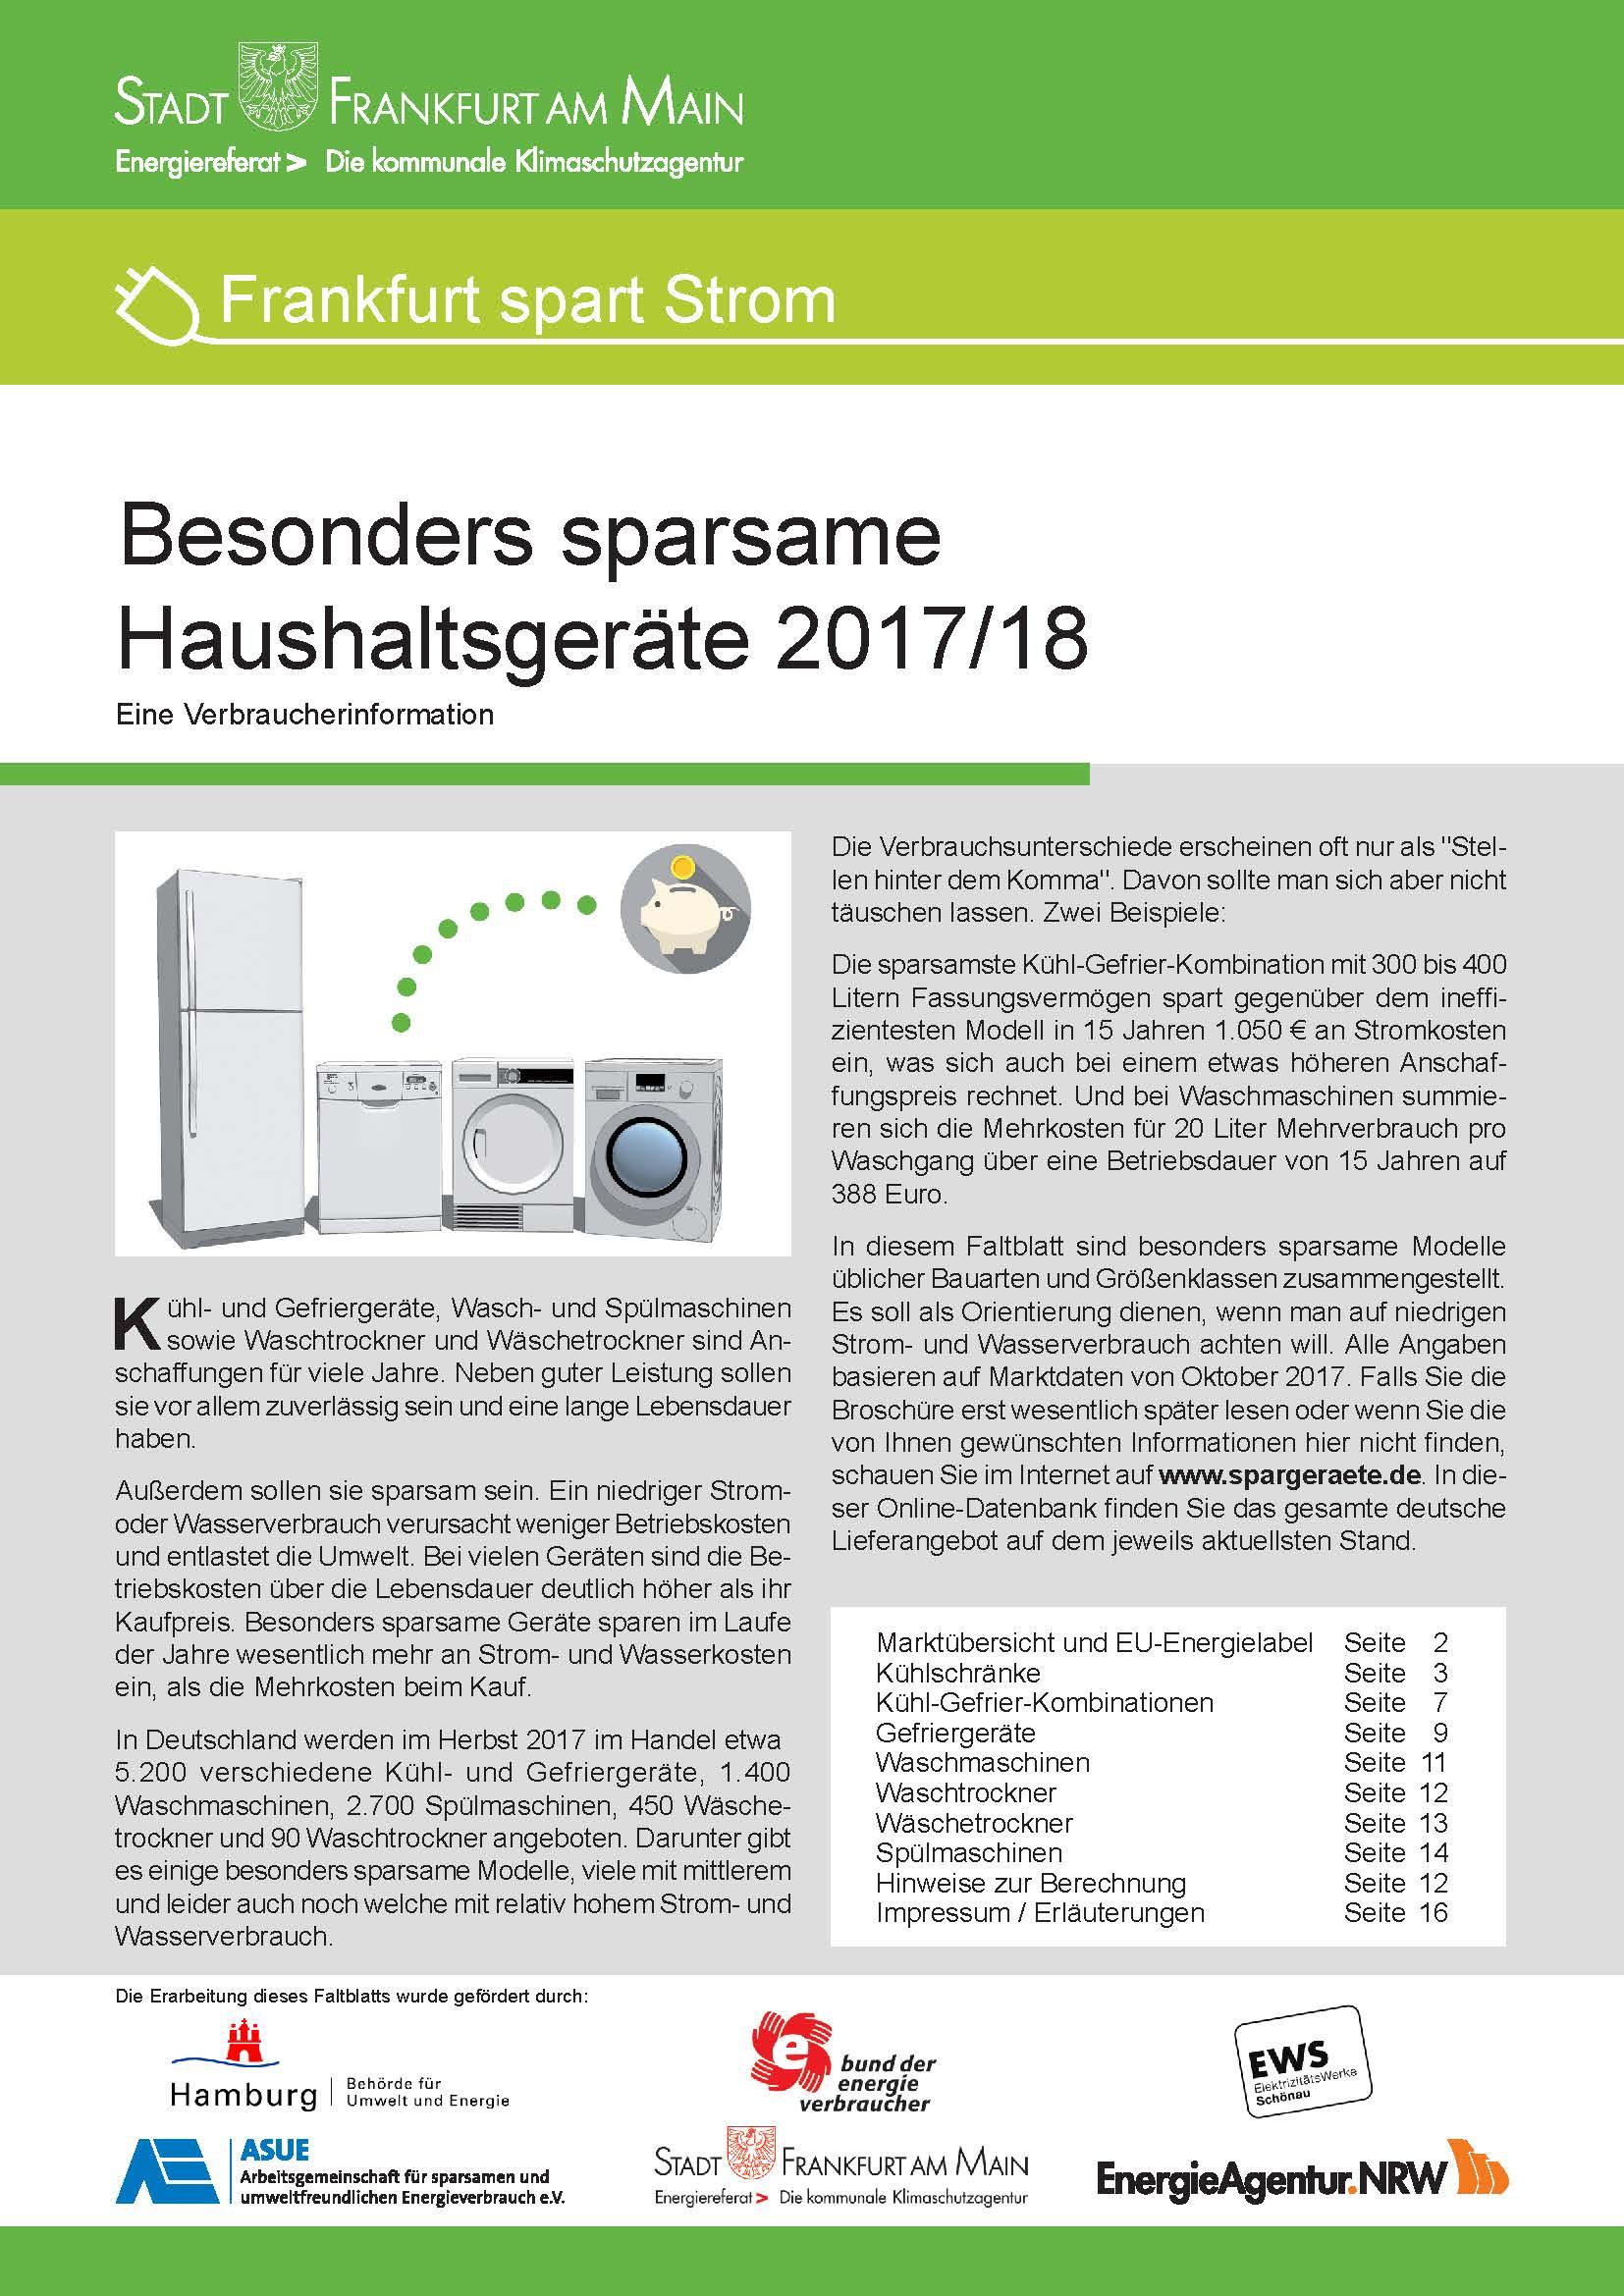 Broschüre Besonders sparsame Haushaltsgeräte 201-18